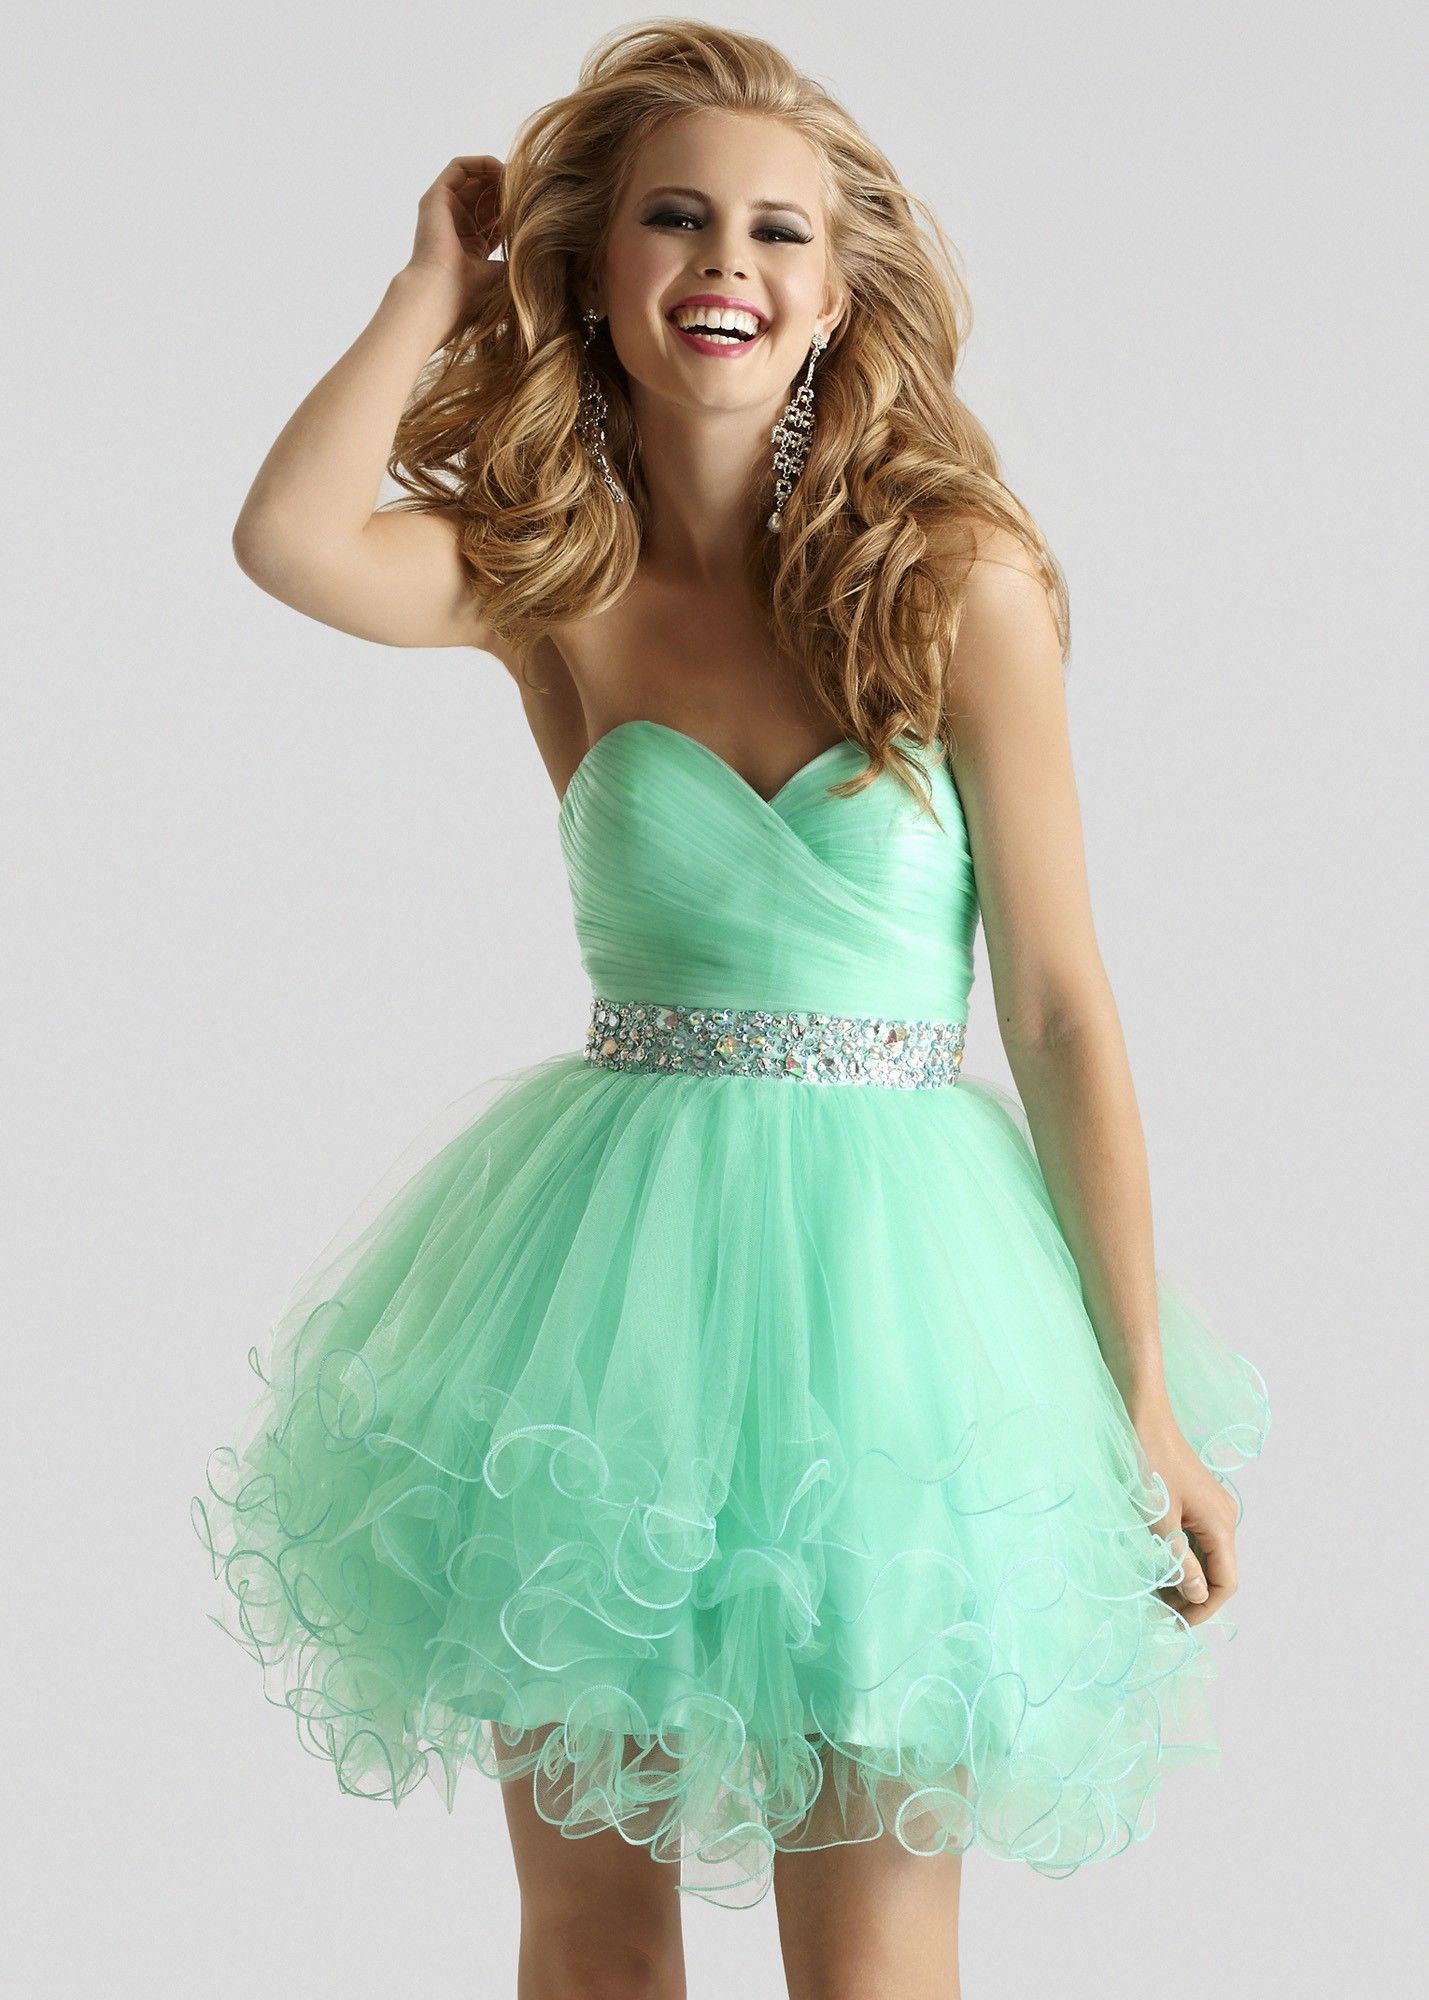 Clarisse strapless short tulle dress looks for lps